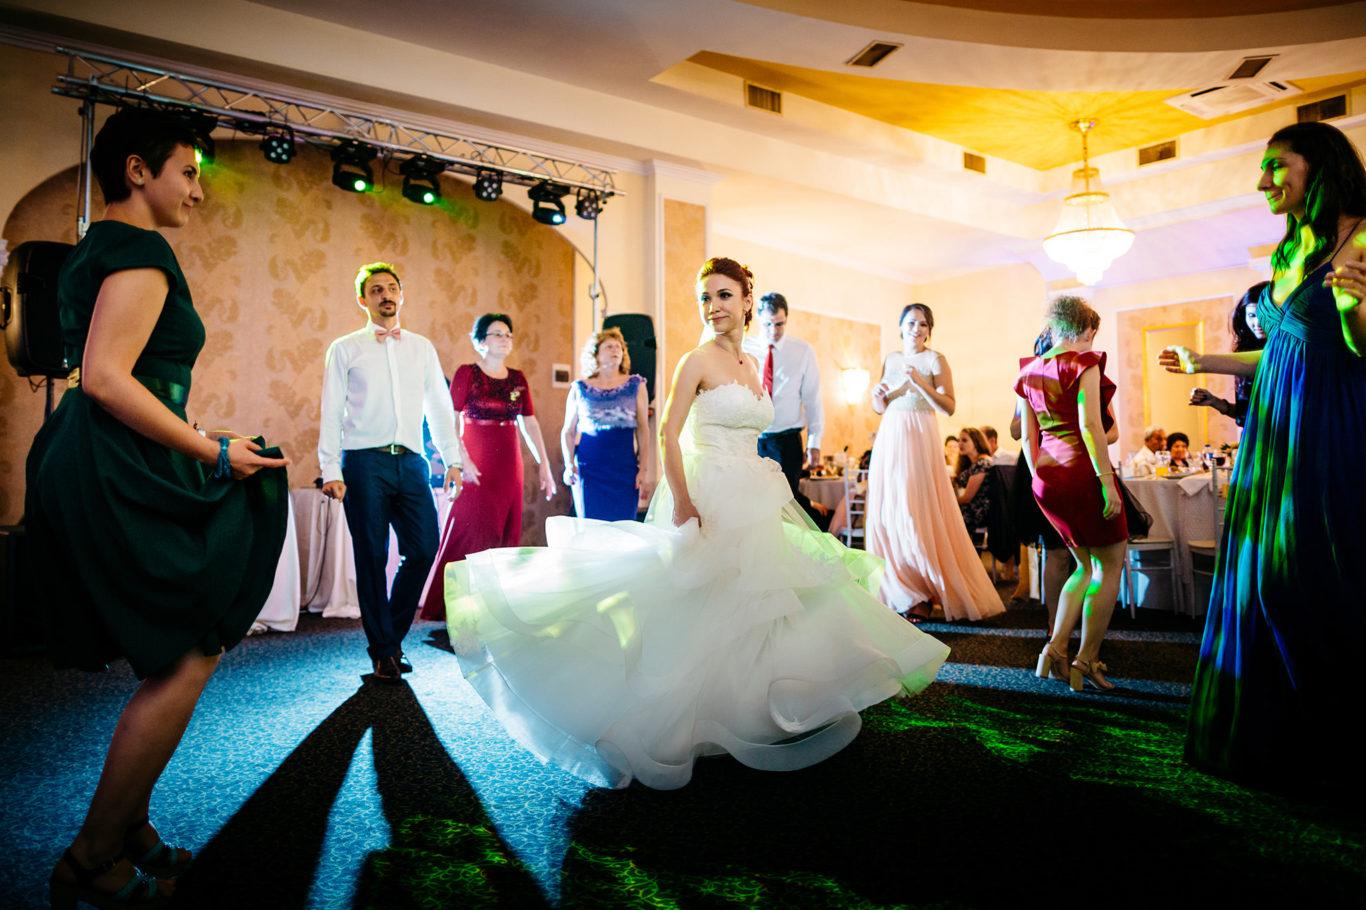 0625-fotografie-nunta-bucuresti-cristina-nicusor-fotograf-ciprian-dumitrescu-dc1_0273-2